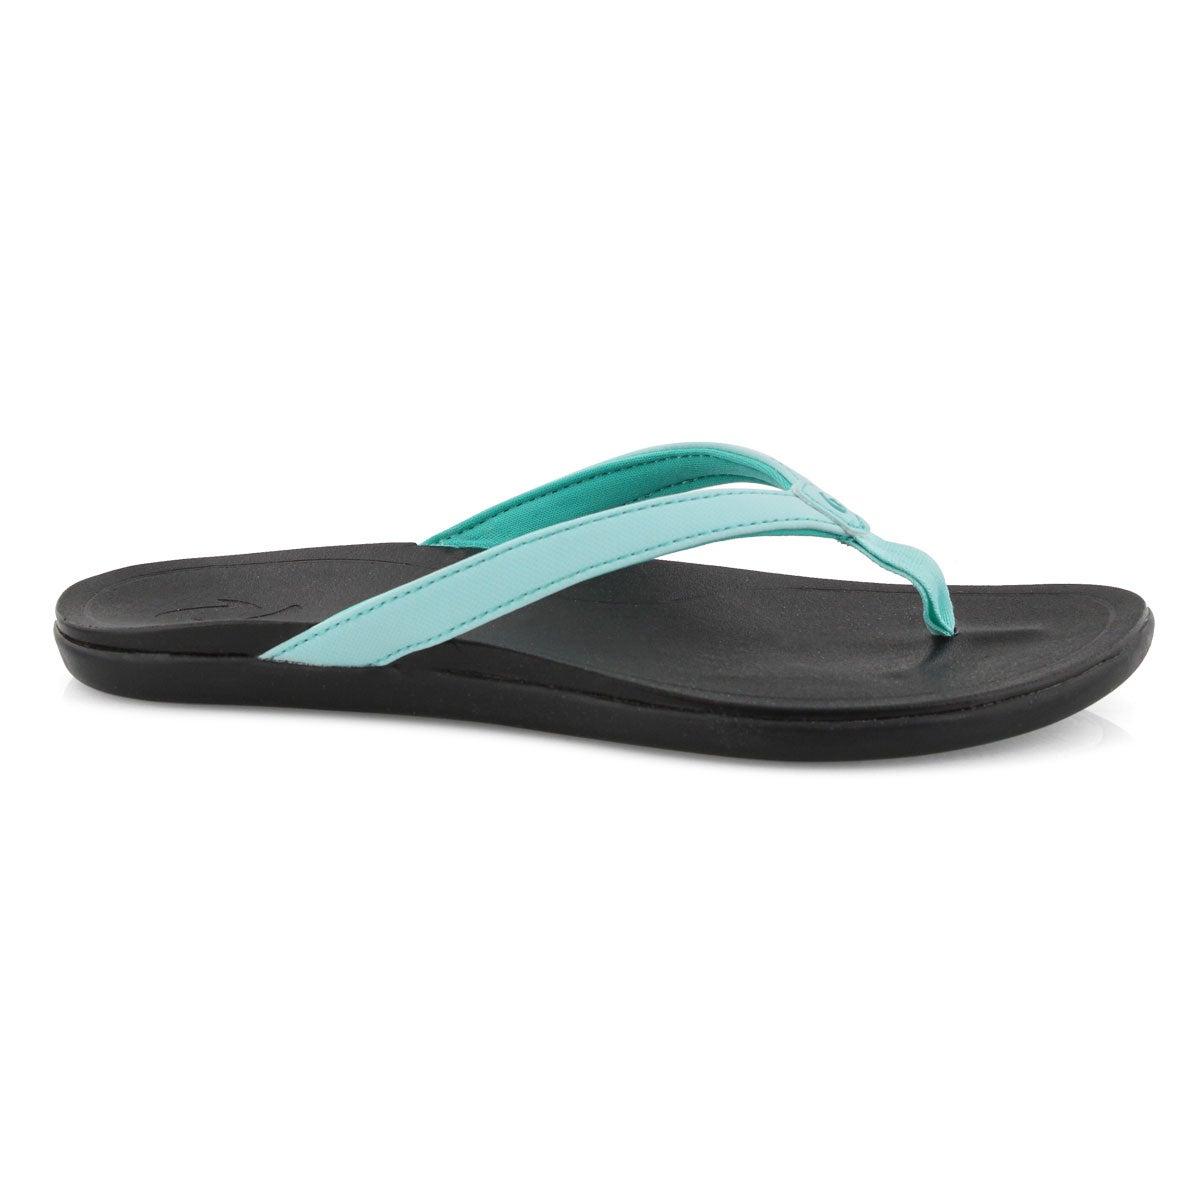 Lds Ho'Opio lagoon/blk thong sandal